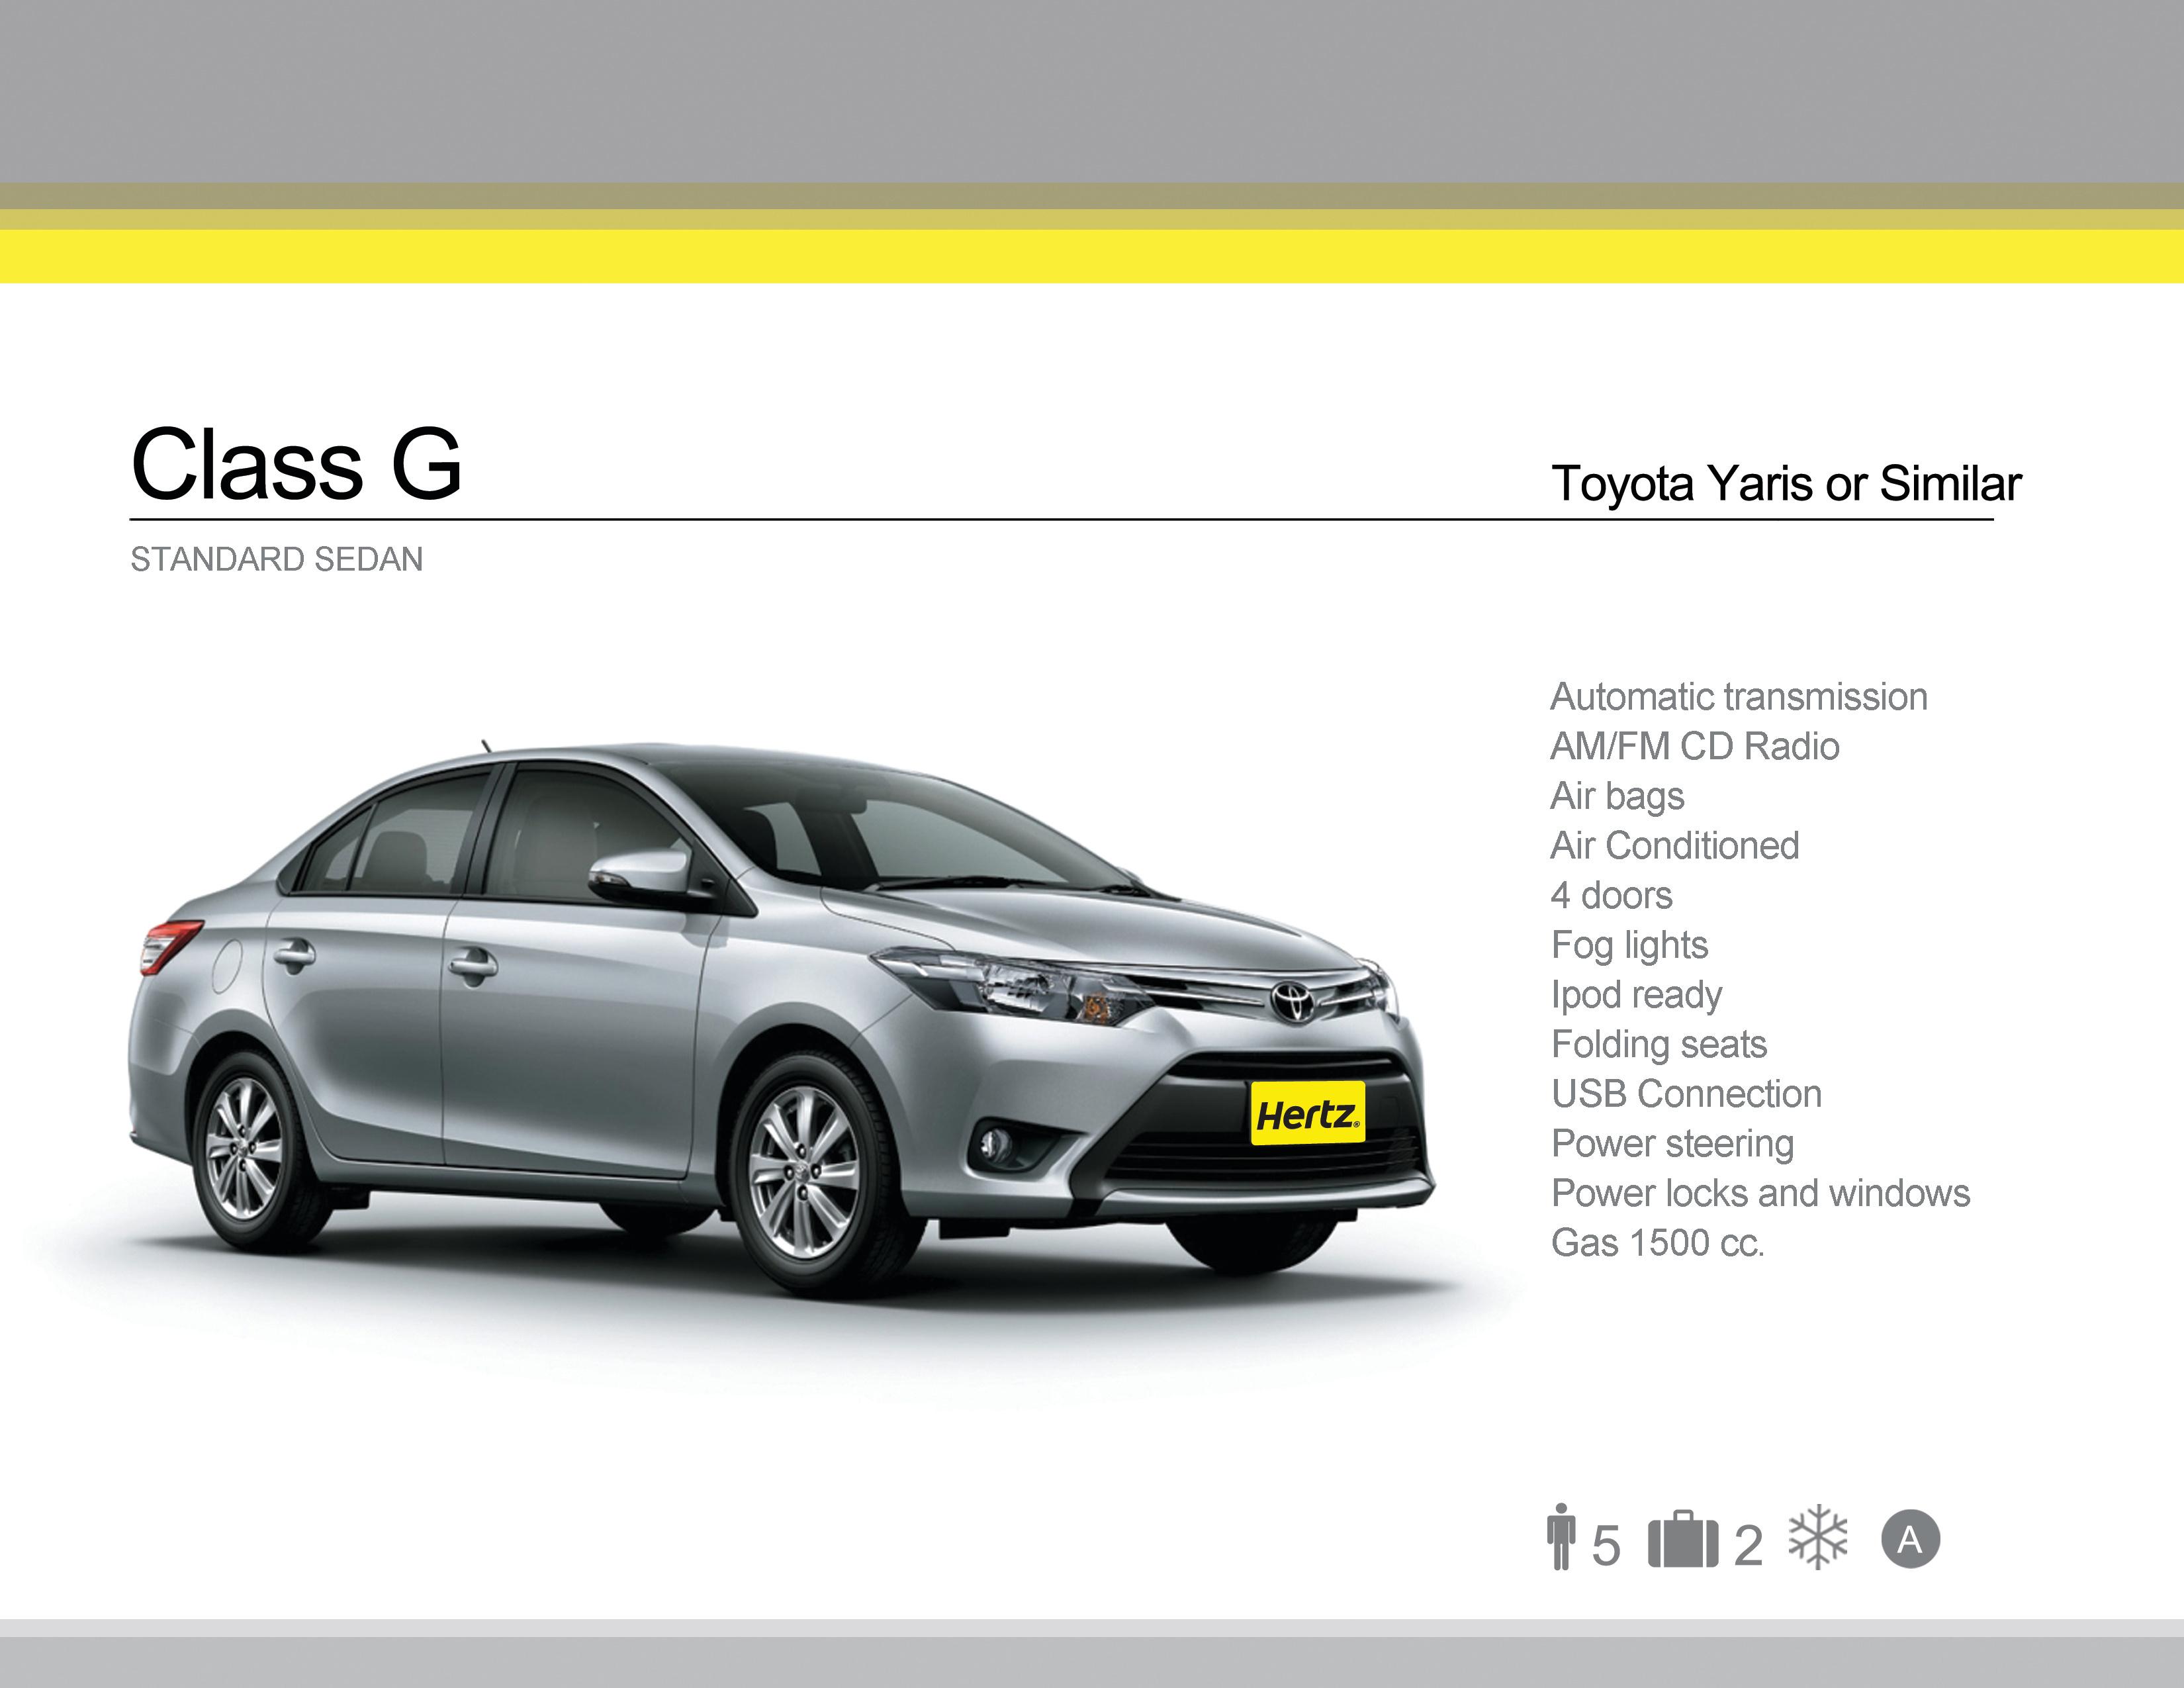 Class E-G - Toyota Yaris or Similar